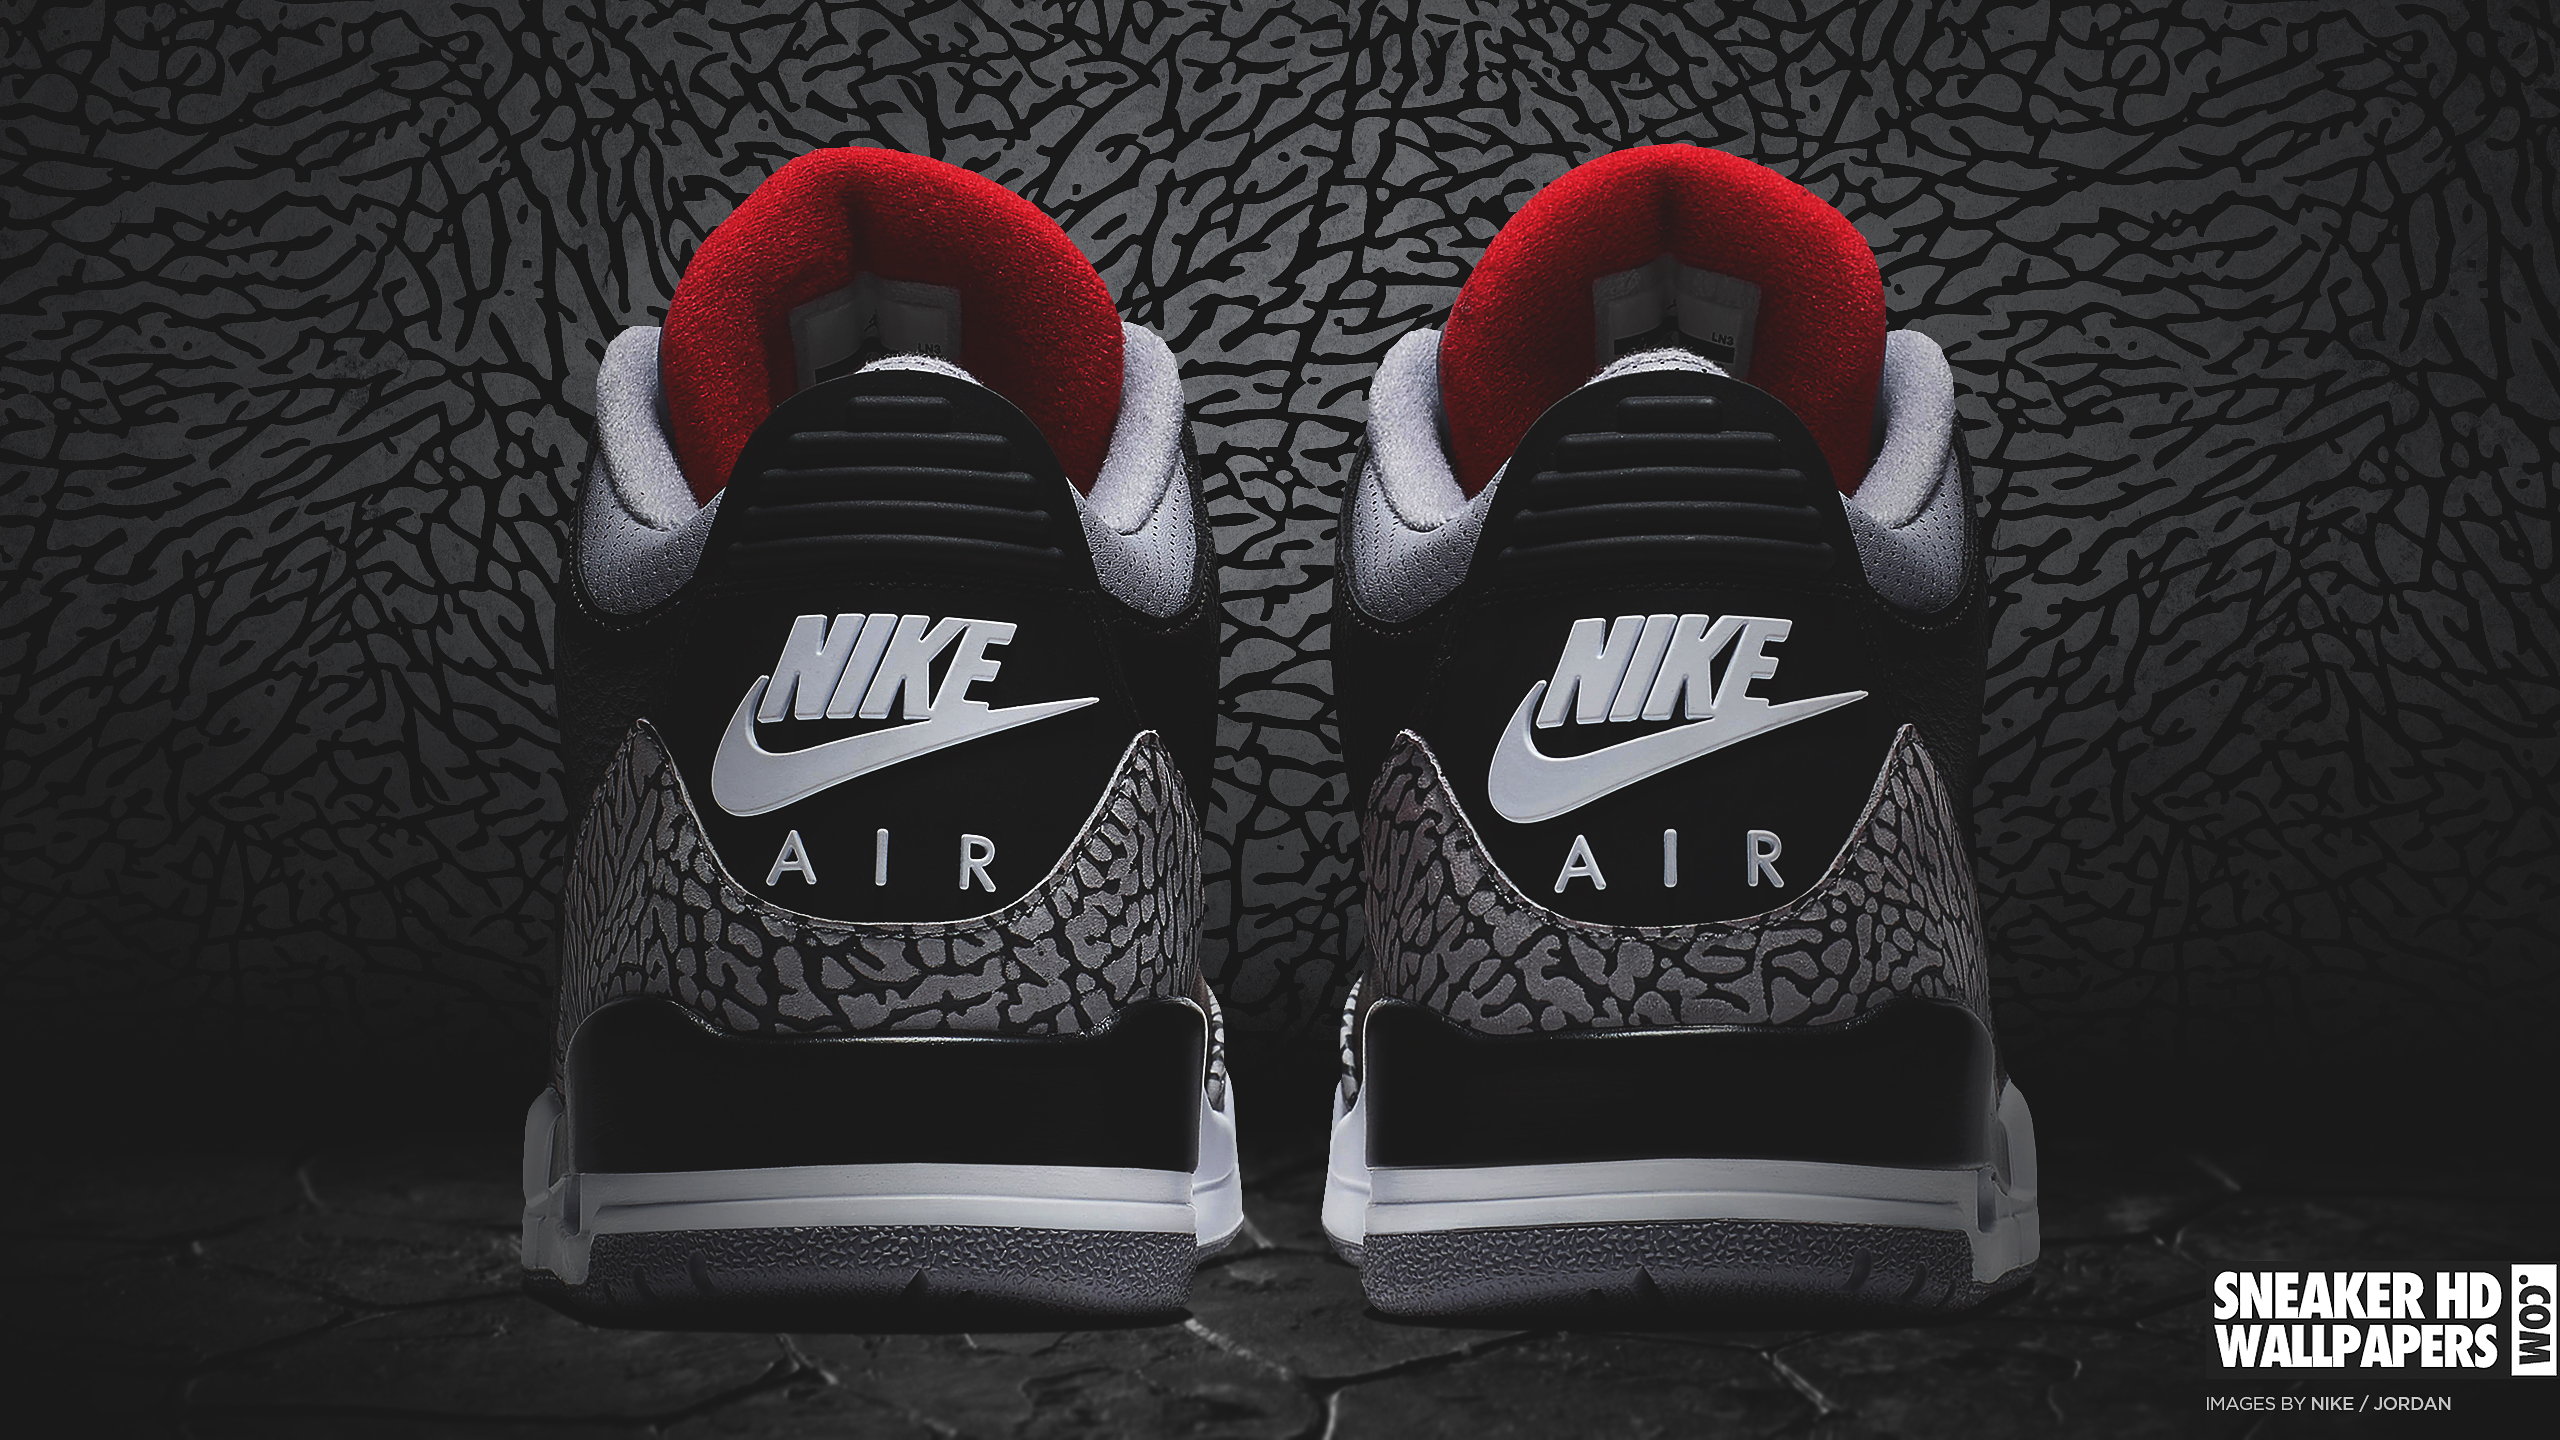 sneakers 3 wallpapers